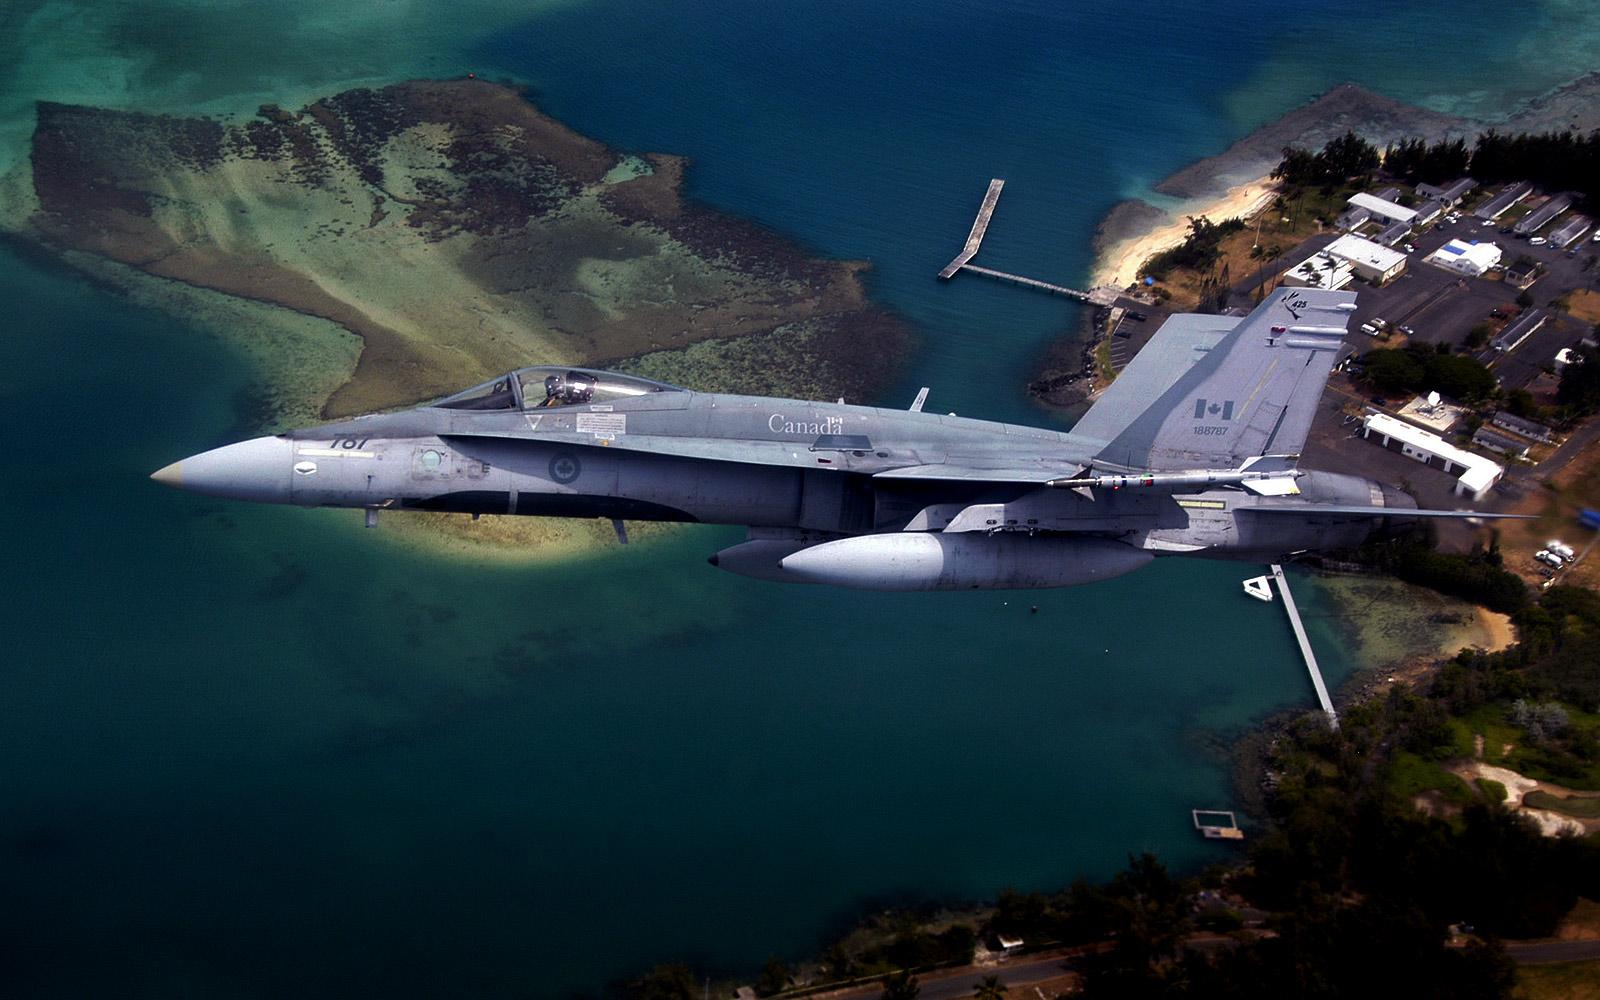 F 18 Hornet Wallpaper Download The F 18 Hornet Wallpaper 1600x1000